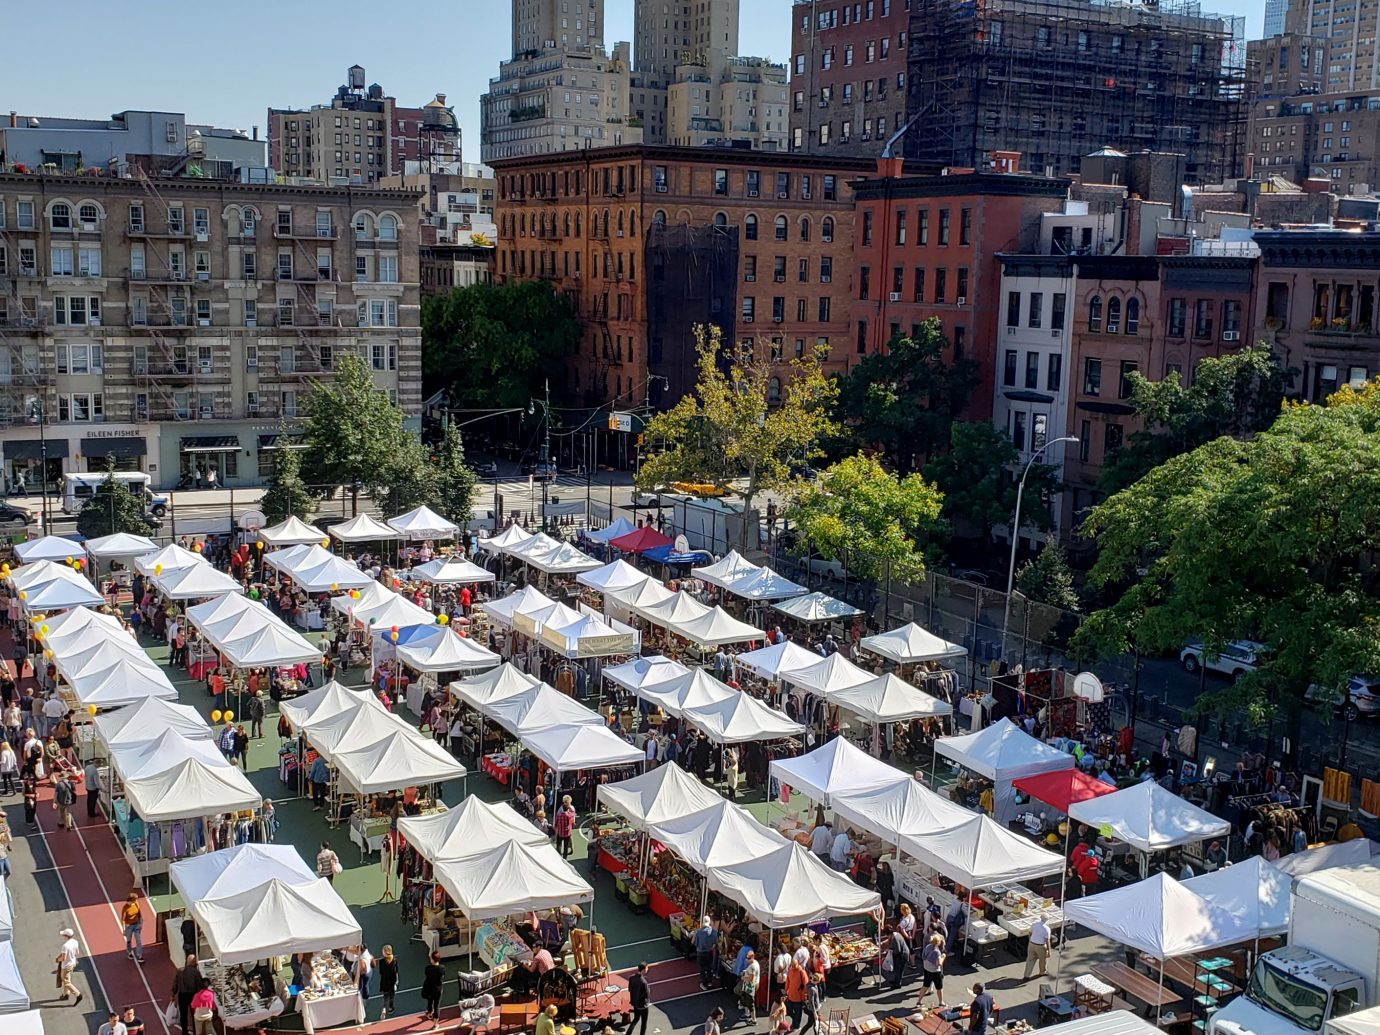 Scary Bazaar tents